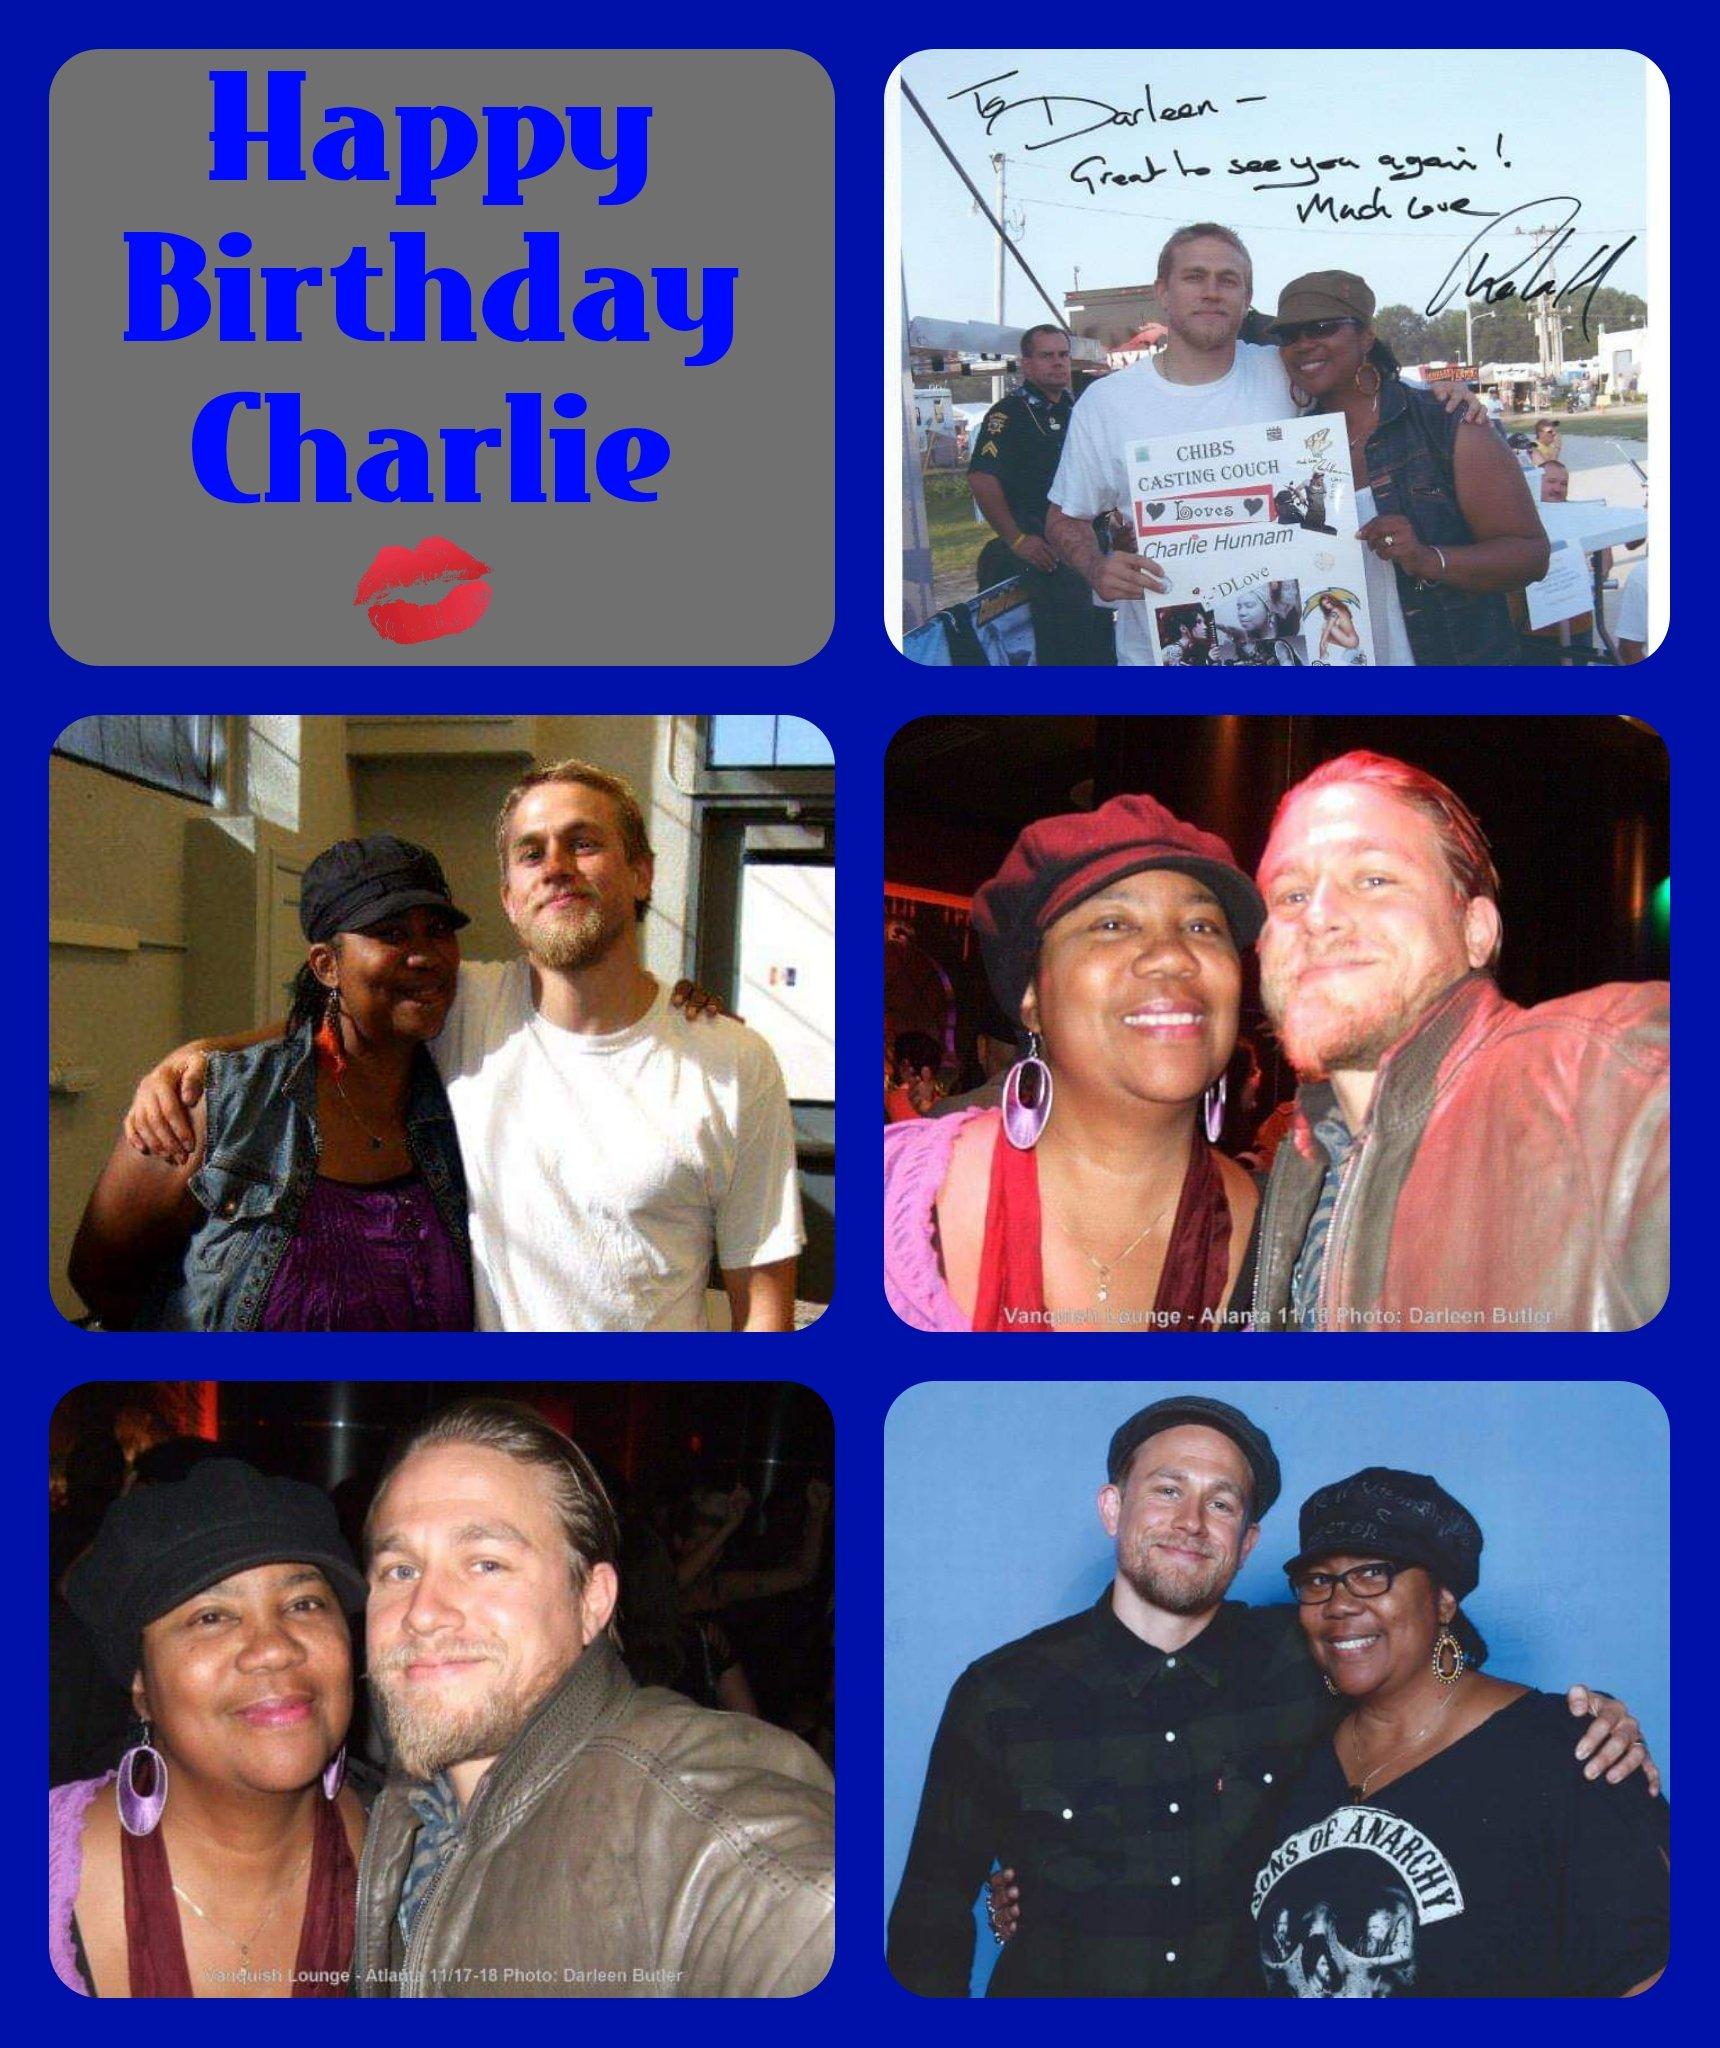 Happy Birthday Charlie Hunnam. Hope your day was grand. LuvznHugz